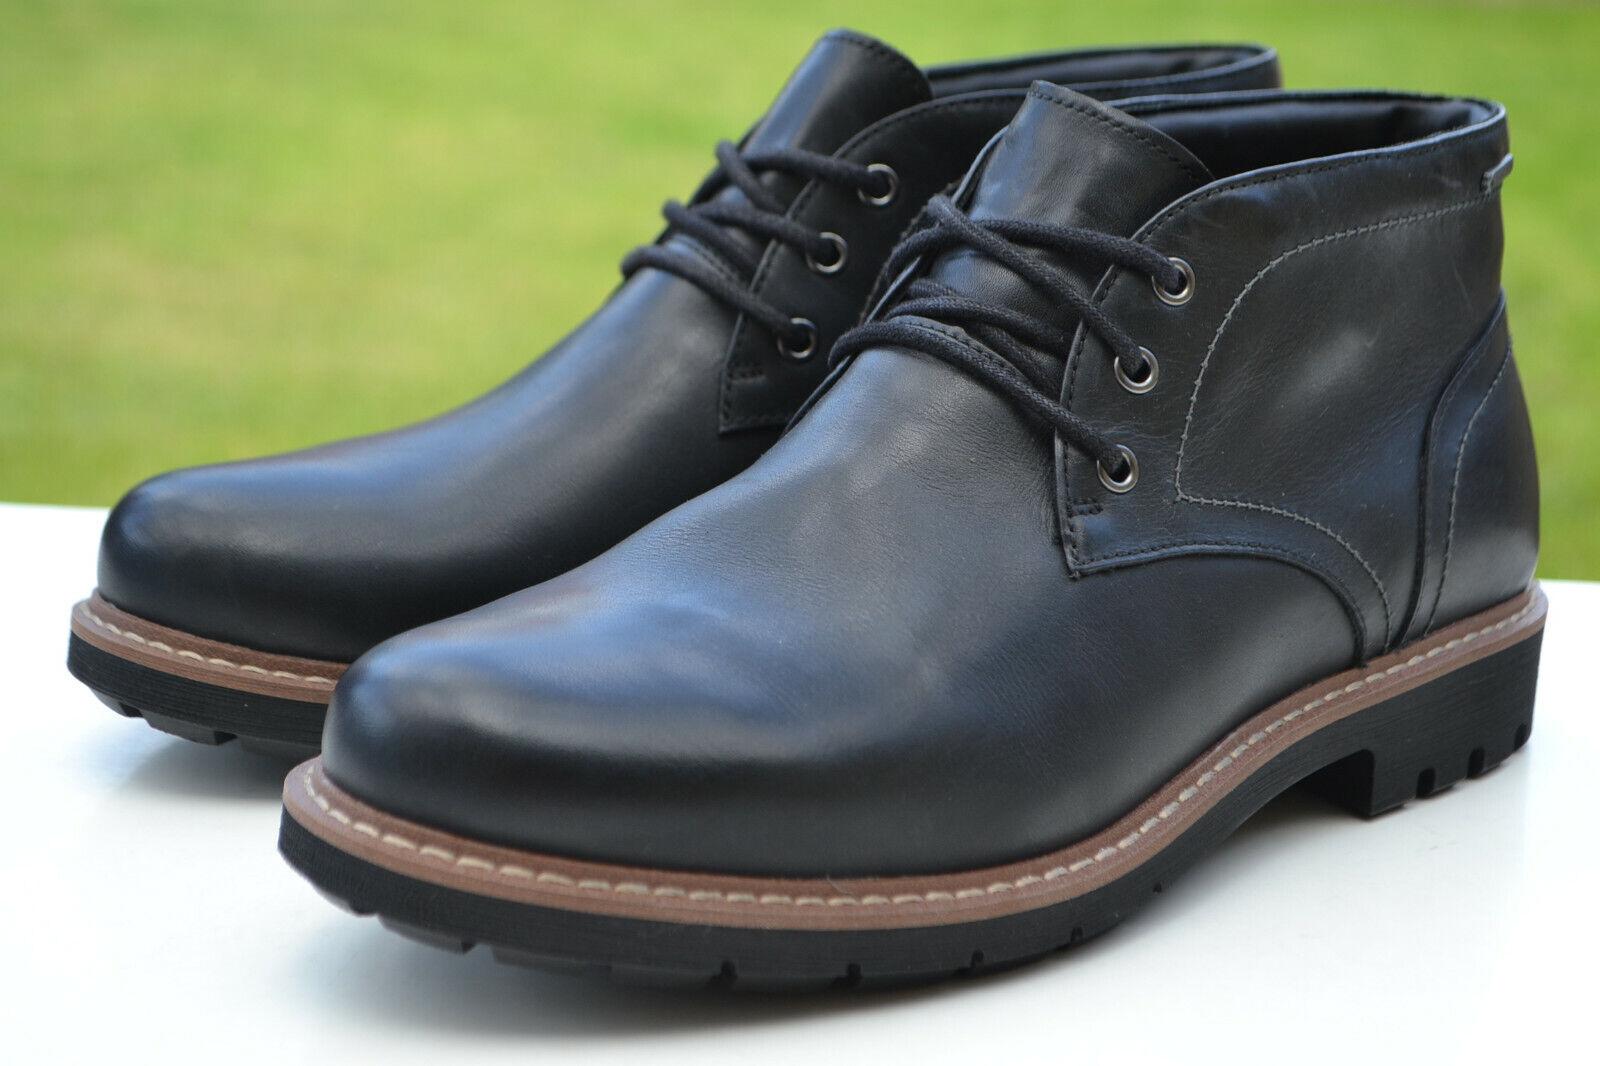 Clarks BNIB Mens Waterproof Chukka Boots BATCOMBE LO GTX Black Leath UK 11 / 46